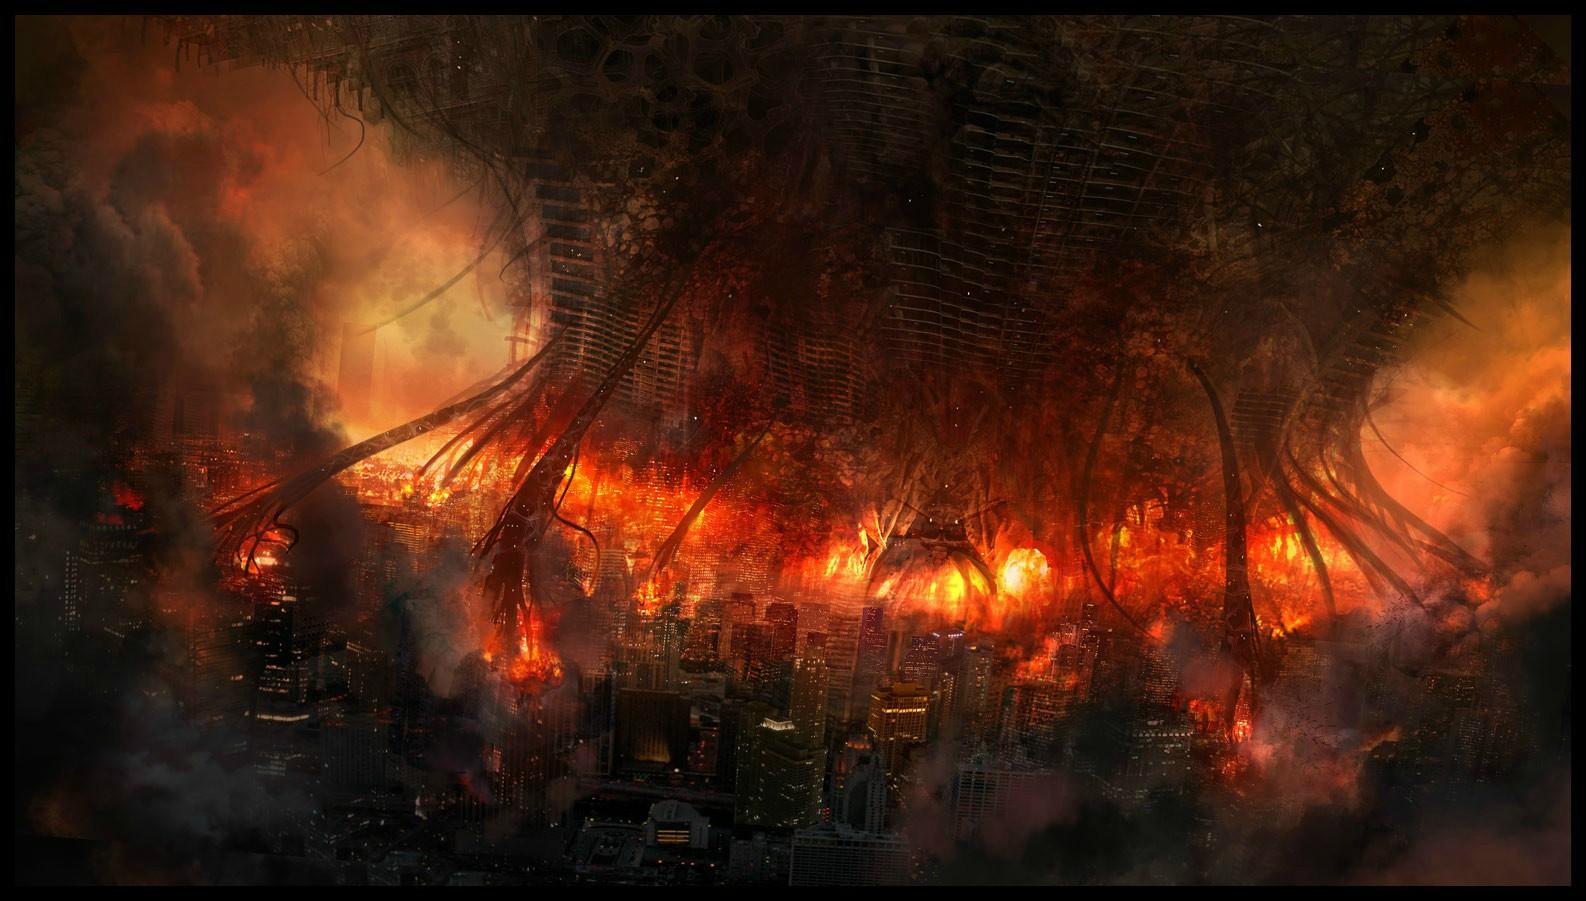 fire apocalypse background - photo #5